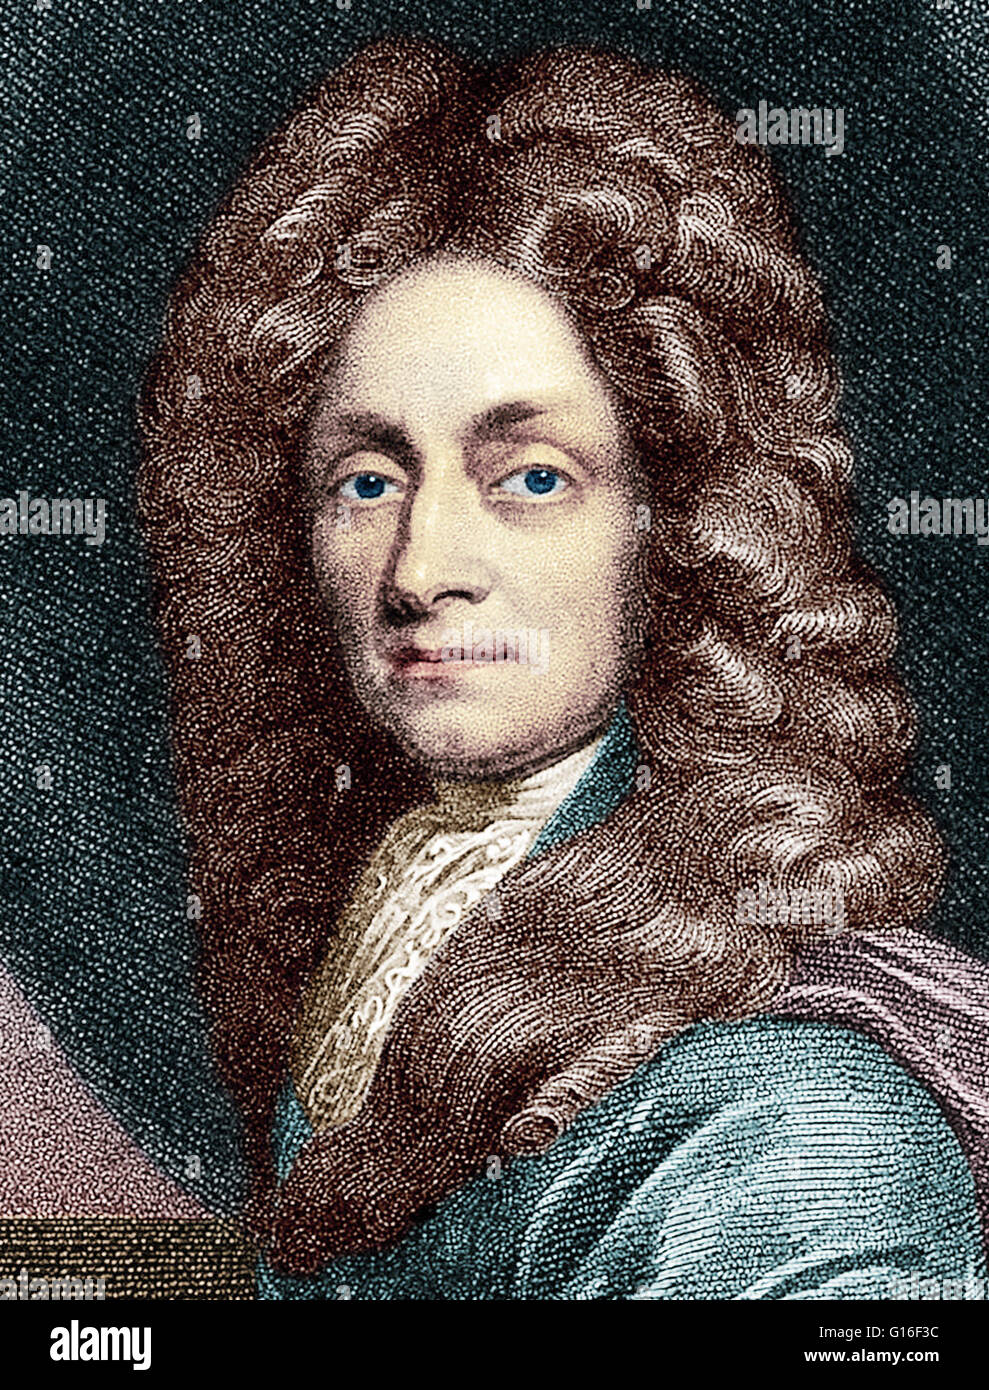 Sir Christopher Wren Portrait Stock Photos & Sir Christopher Wren ...